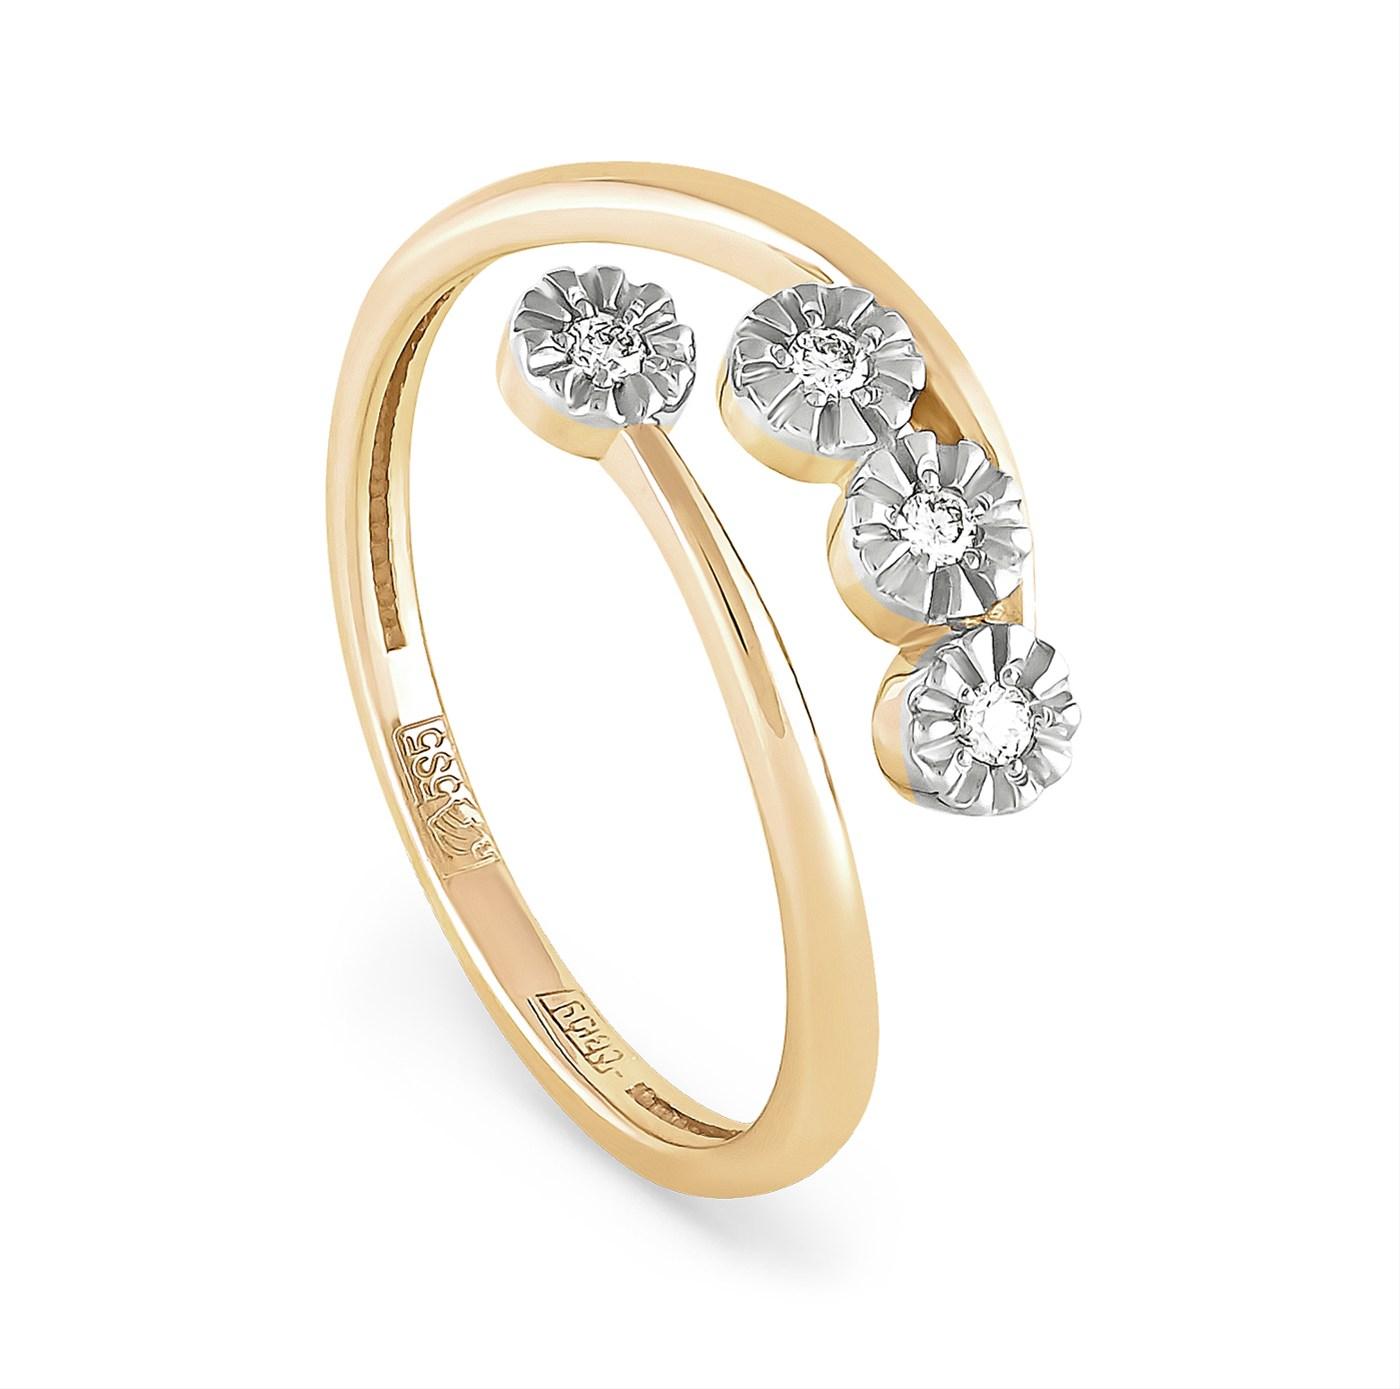 Кольцо из лимонного золота Бриллиант арт. 1-2381-1000 1-2381-1000